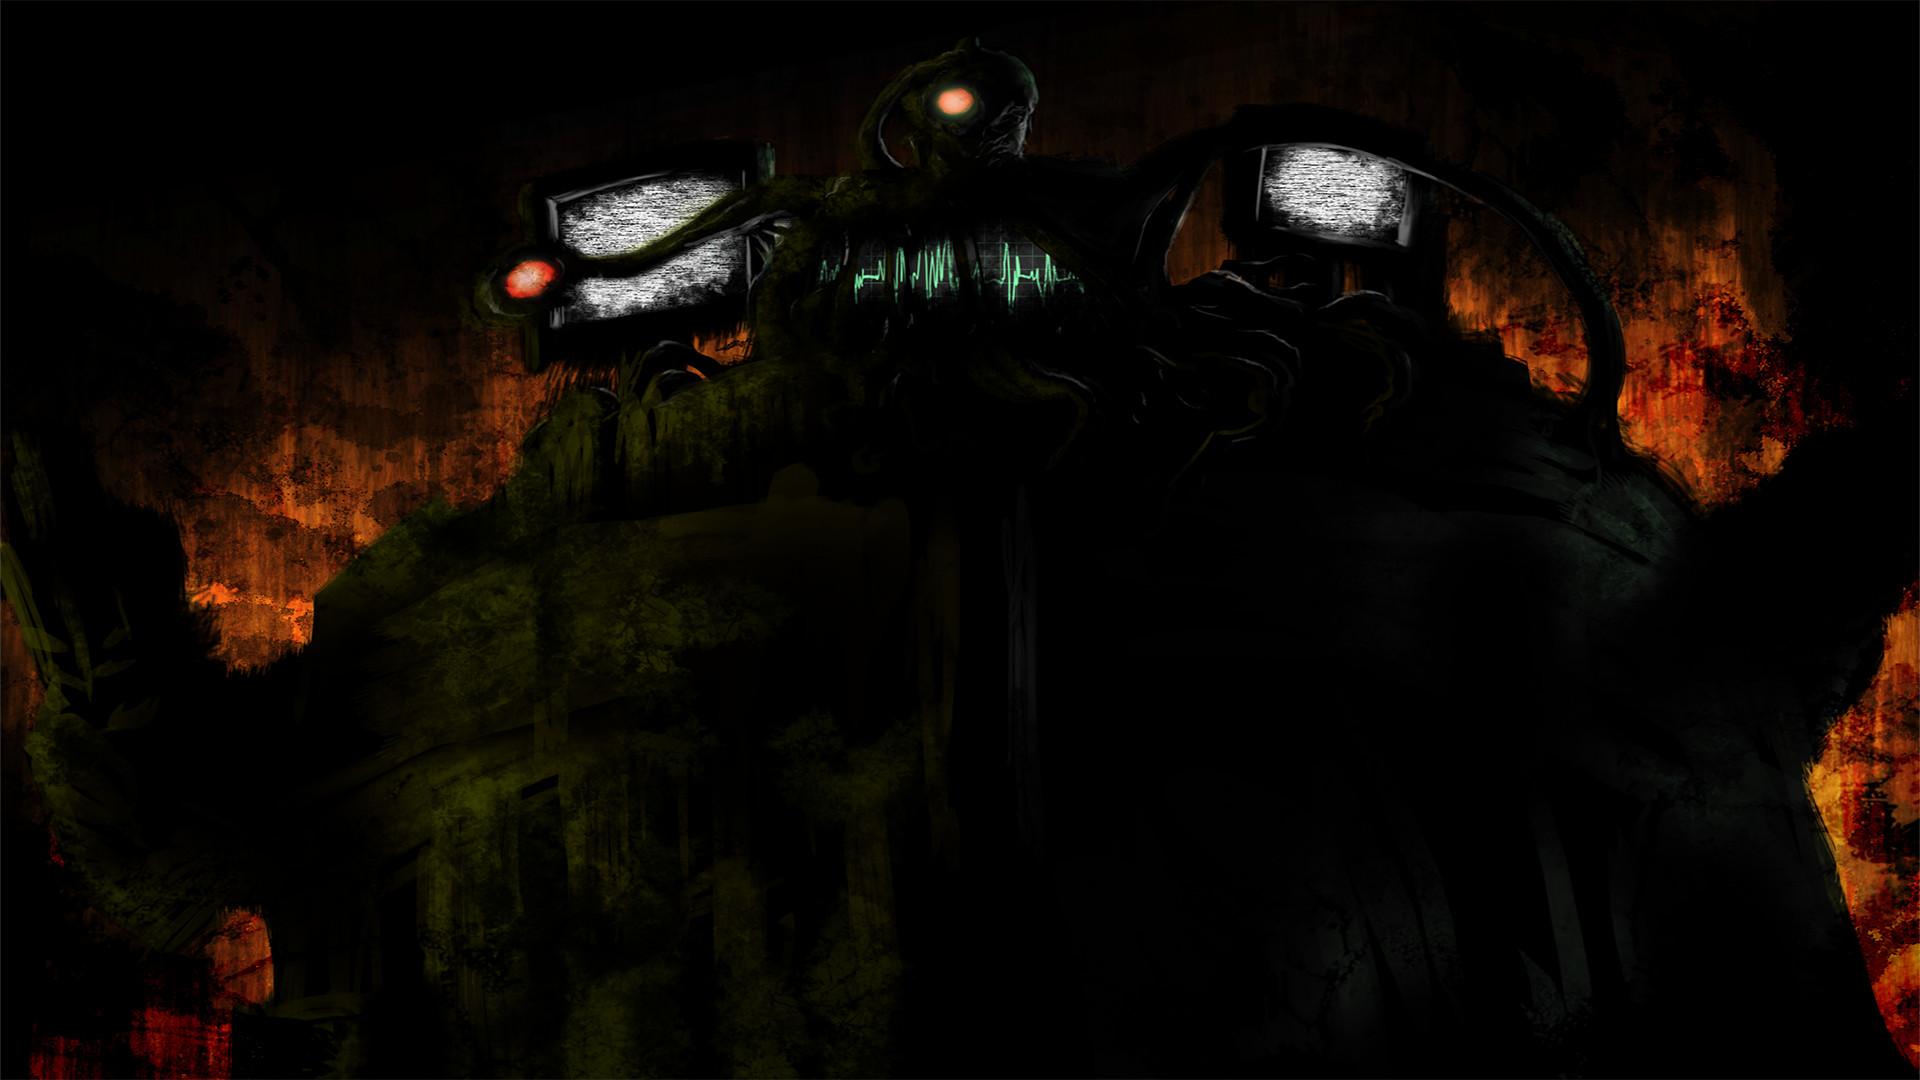 Res: 1920x1080, Original ShoddyCast Wallpaper – Fallout (The Master)